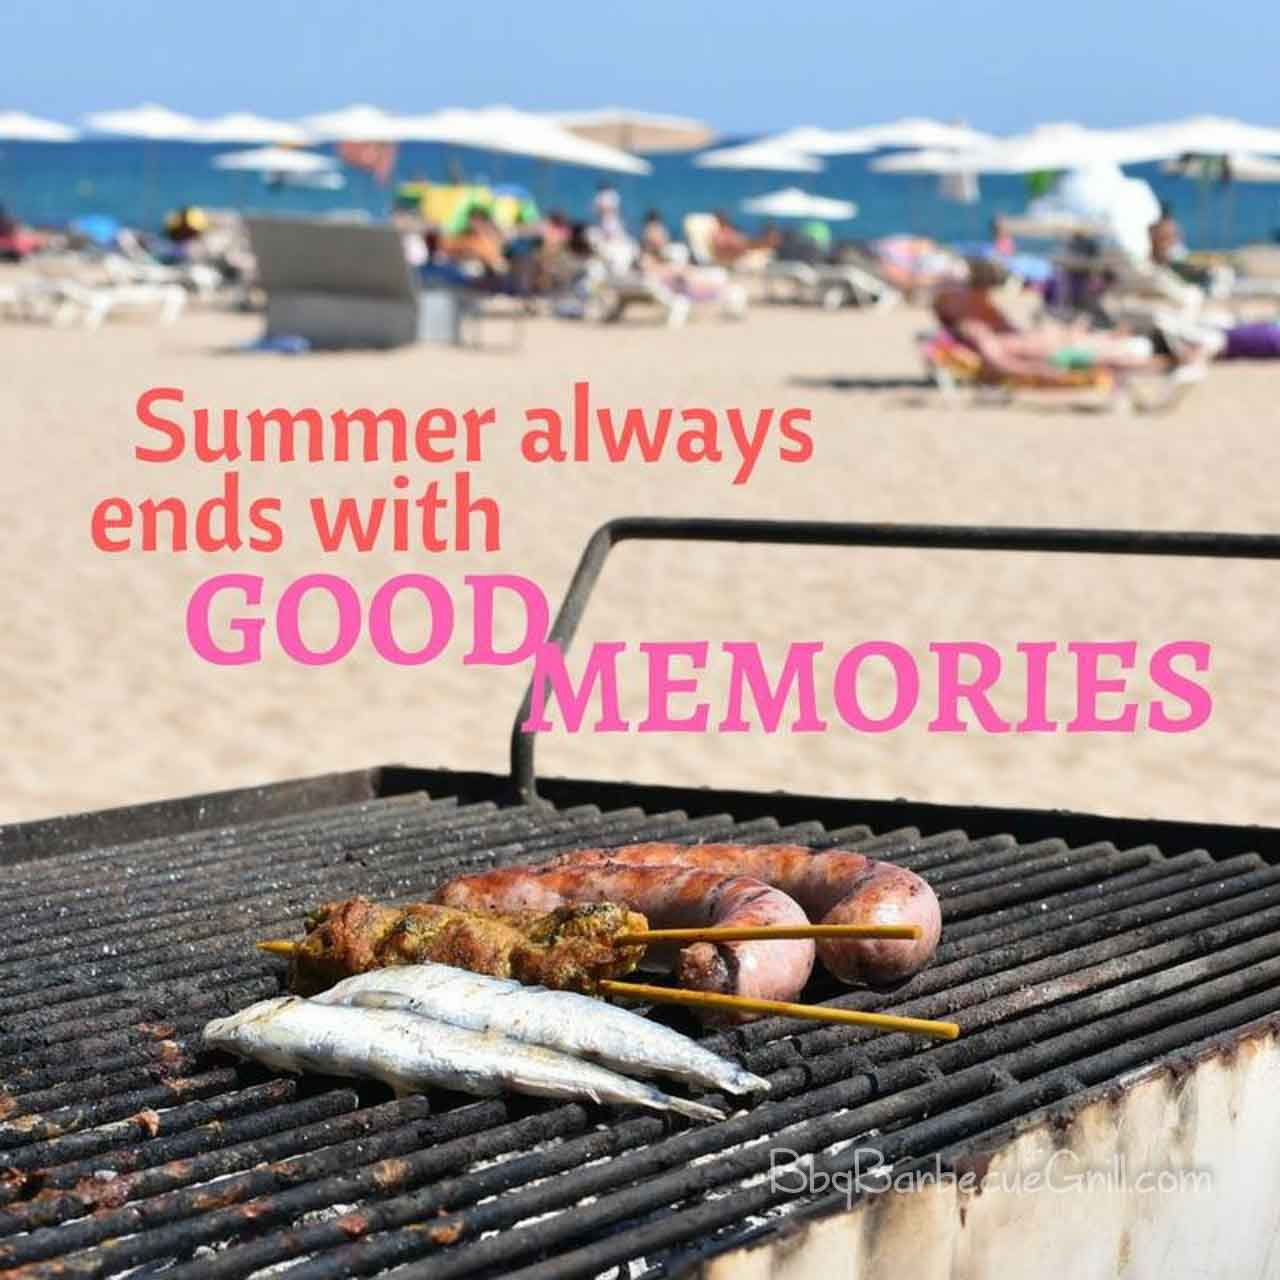 Summer always ends with good memories.